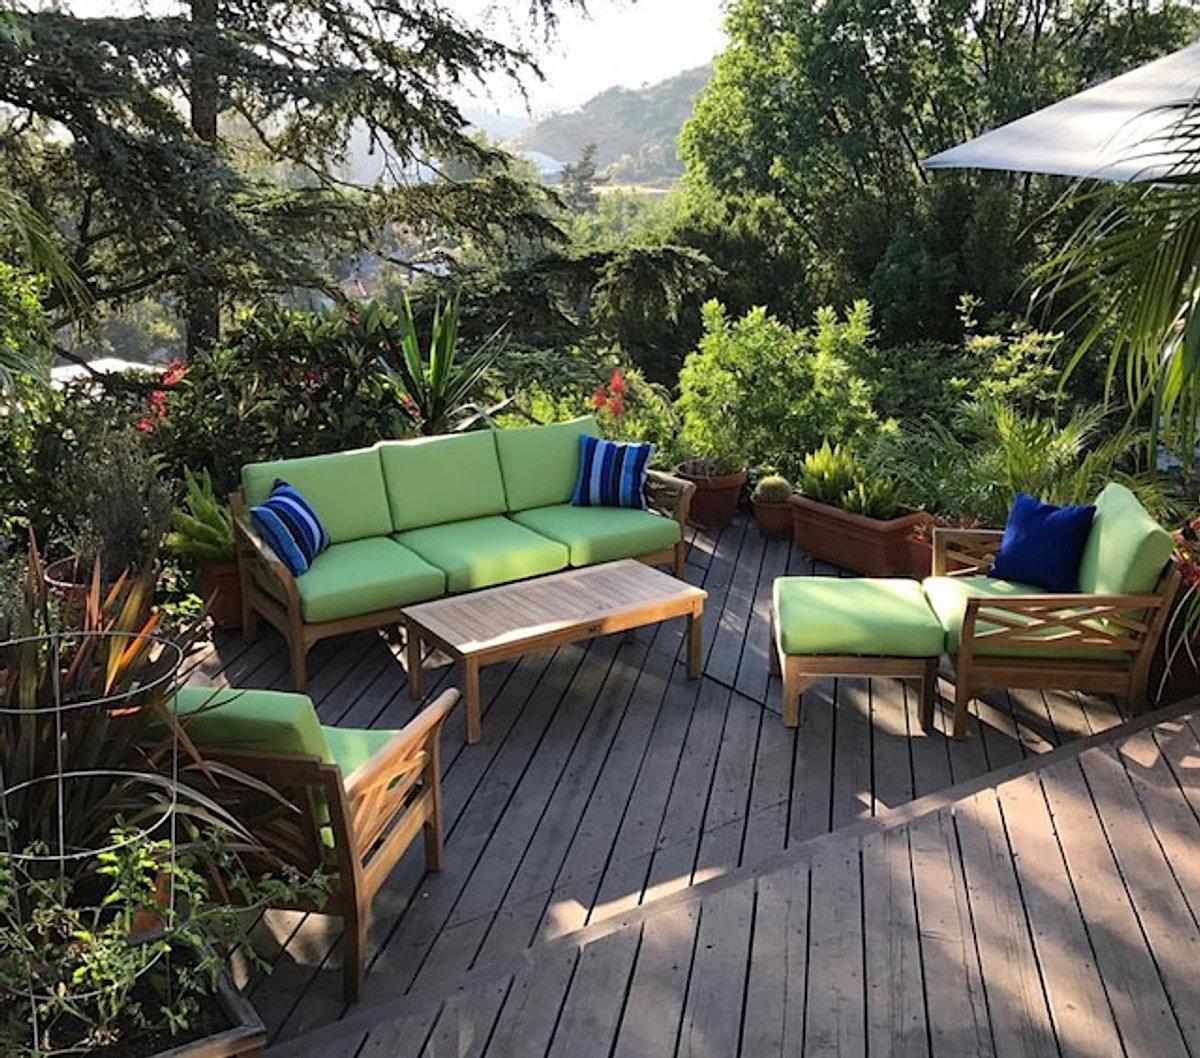 Teak Patio Furniture Store In Woodland Hills, CA